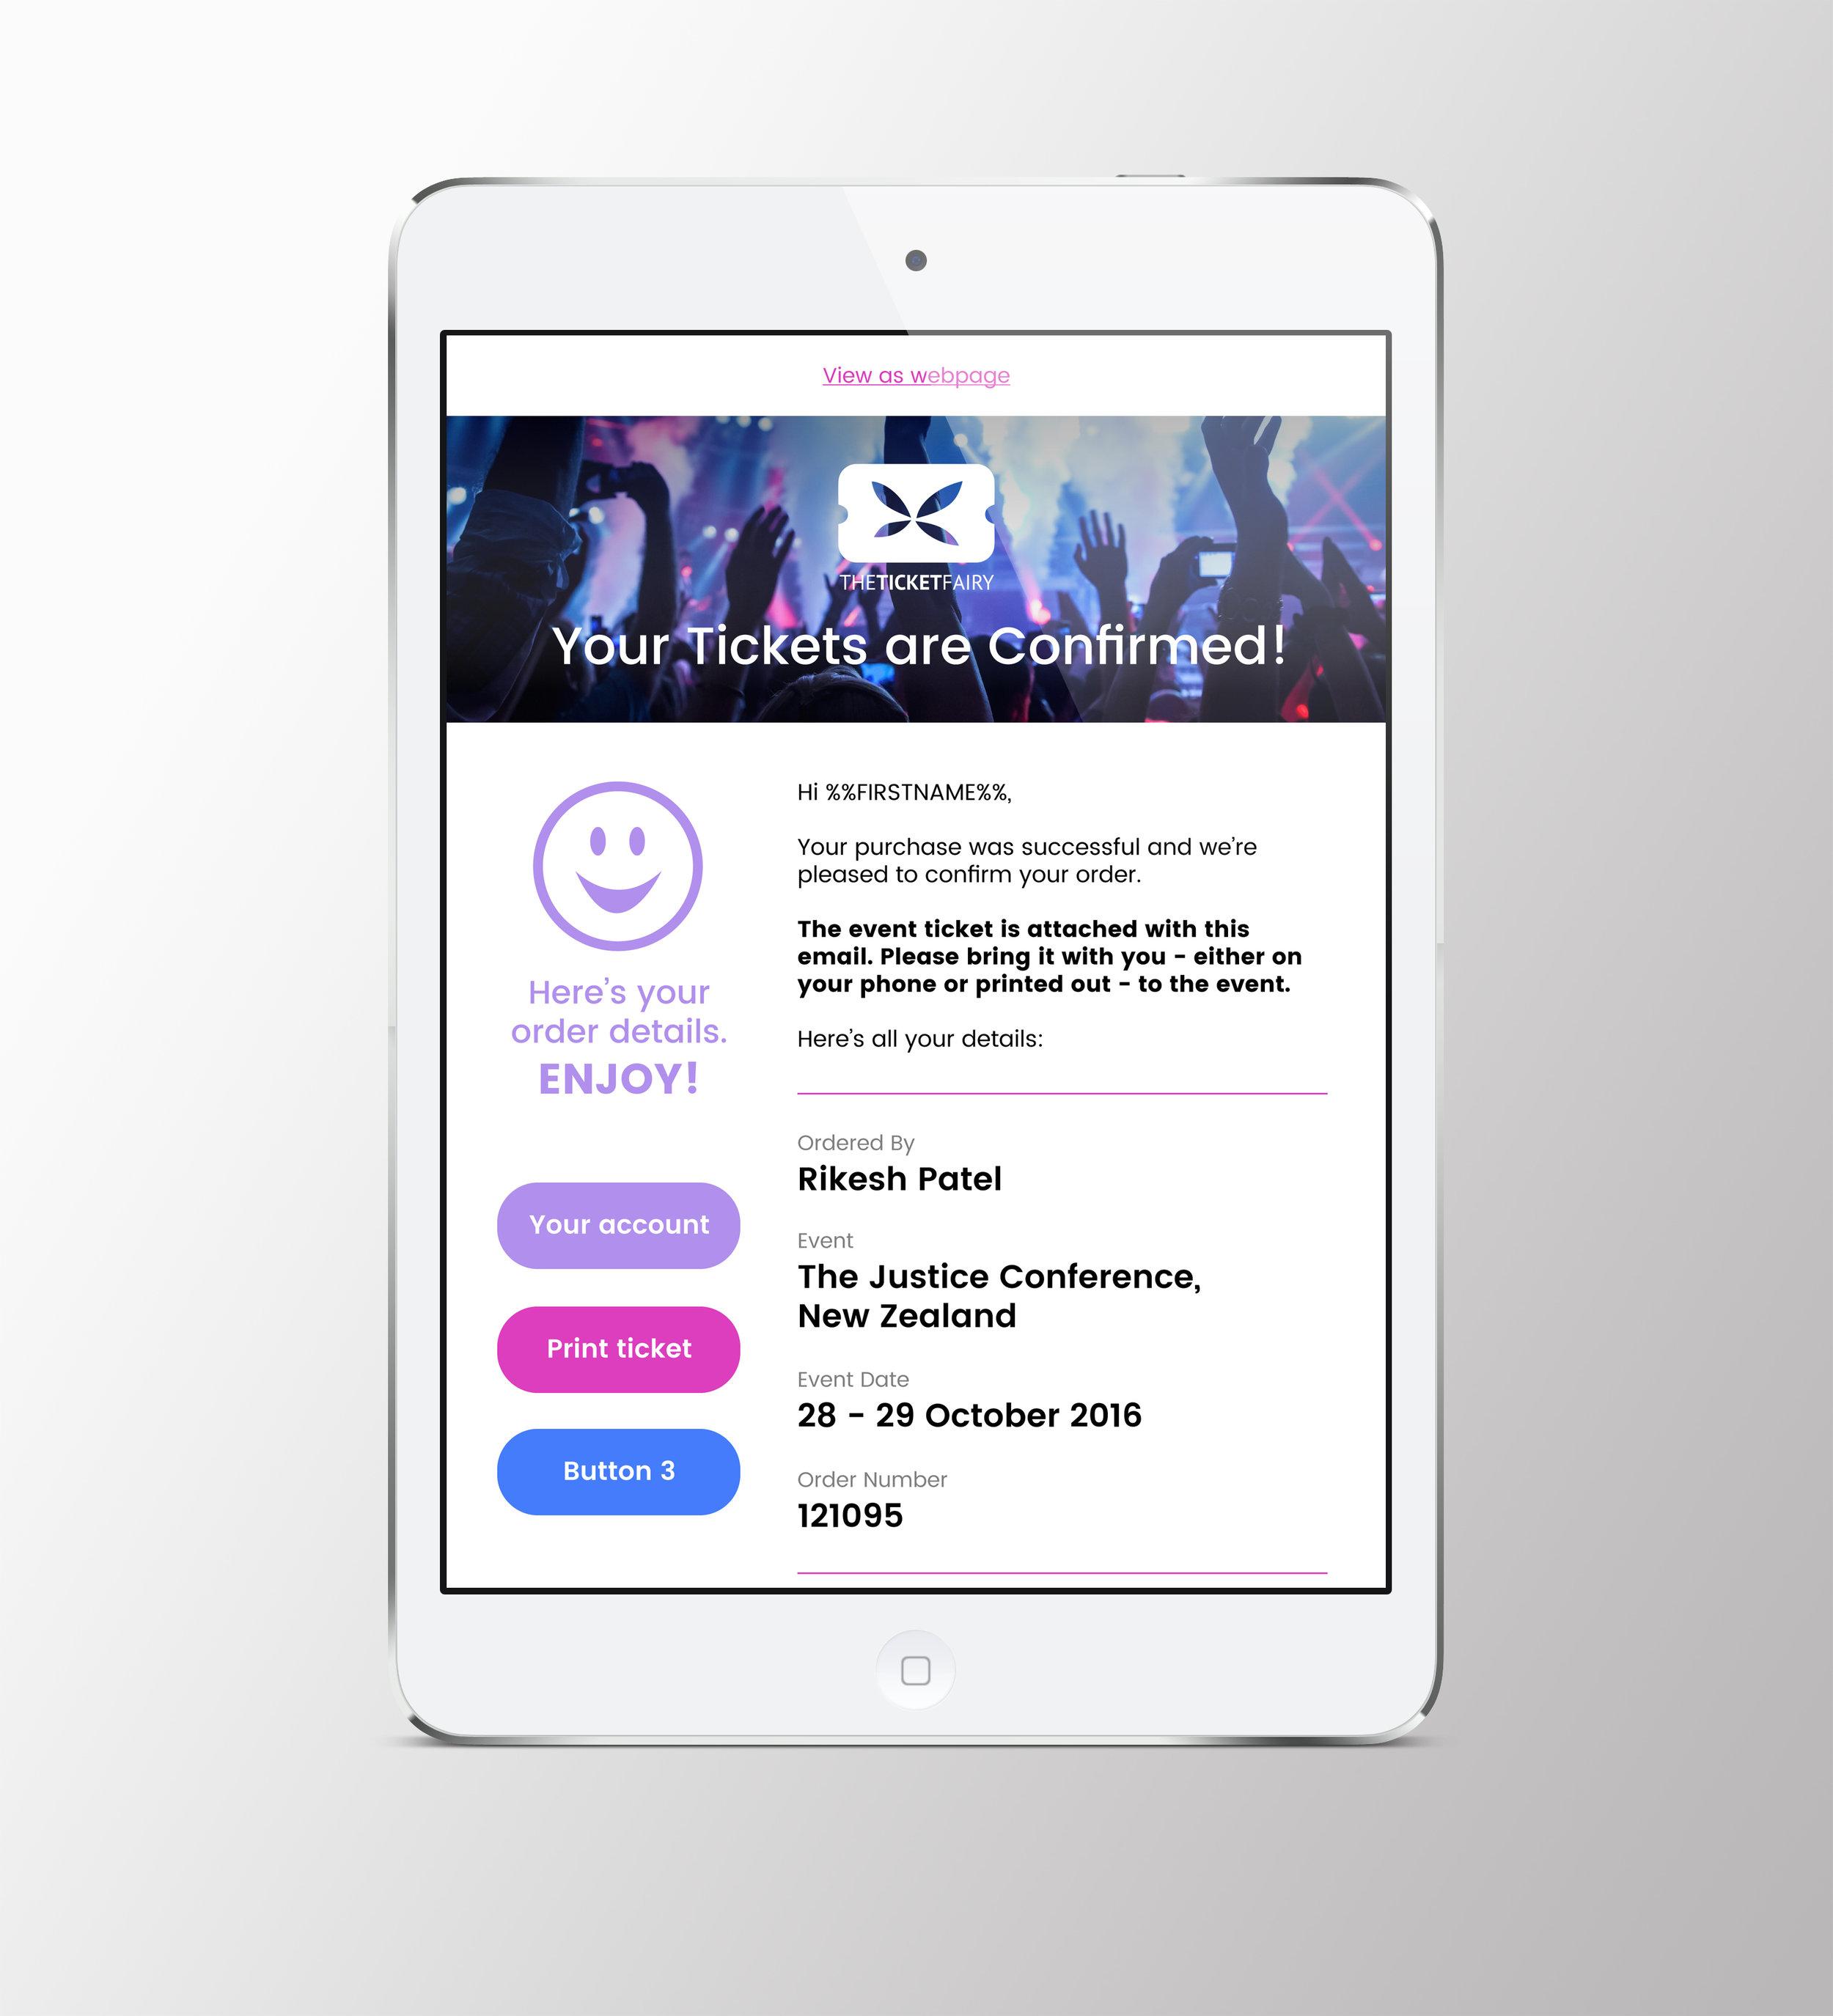 Ticket Fairy - Emailer MOCKUP 1.jpg